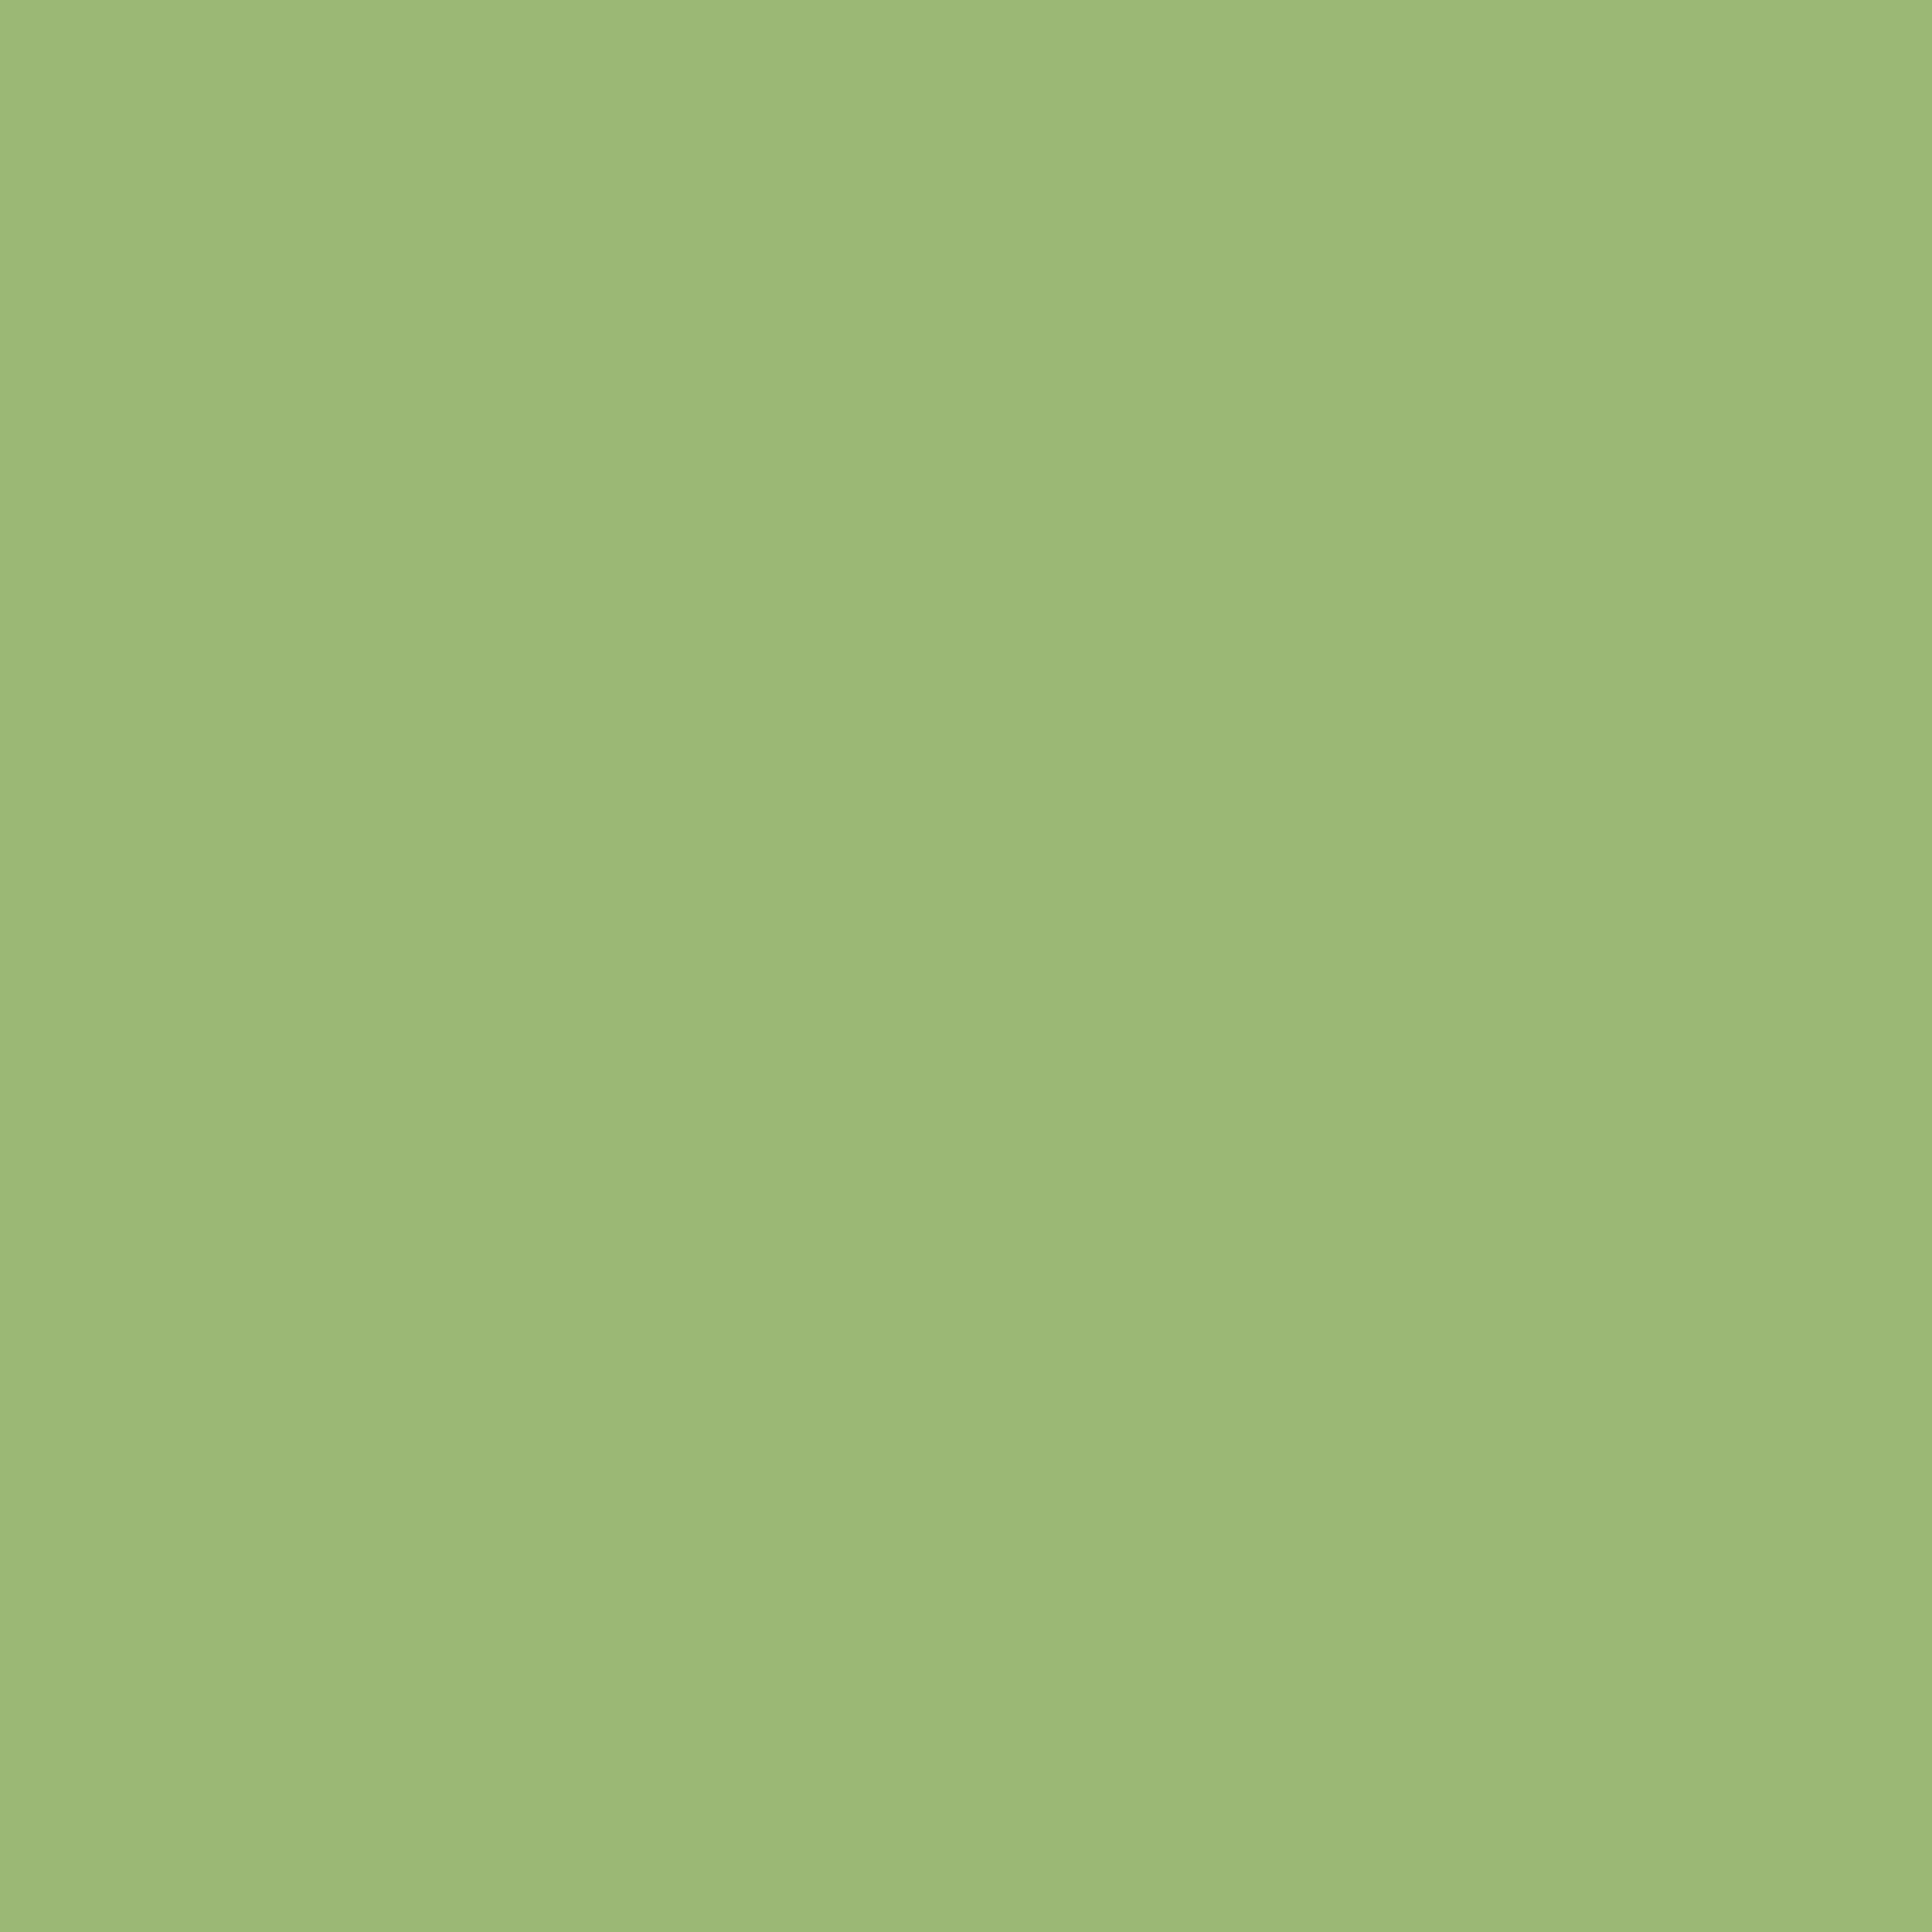 3600x3600 Olivine Solid Color Background